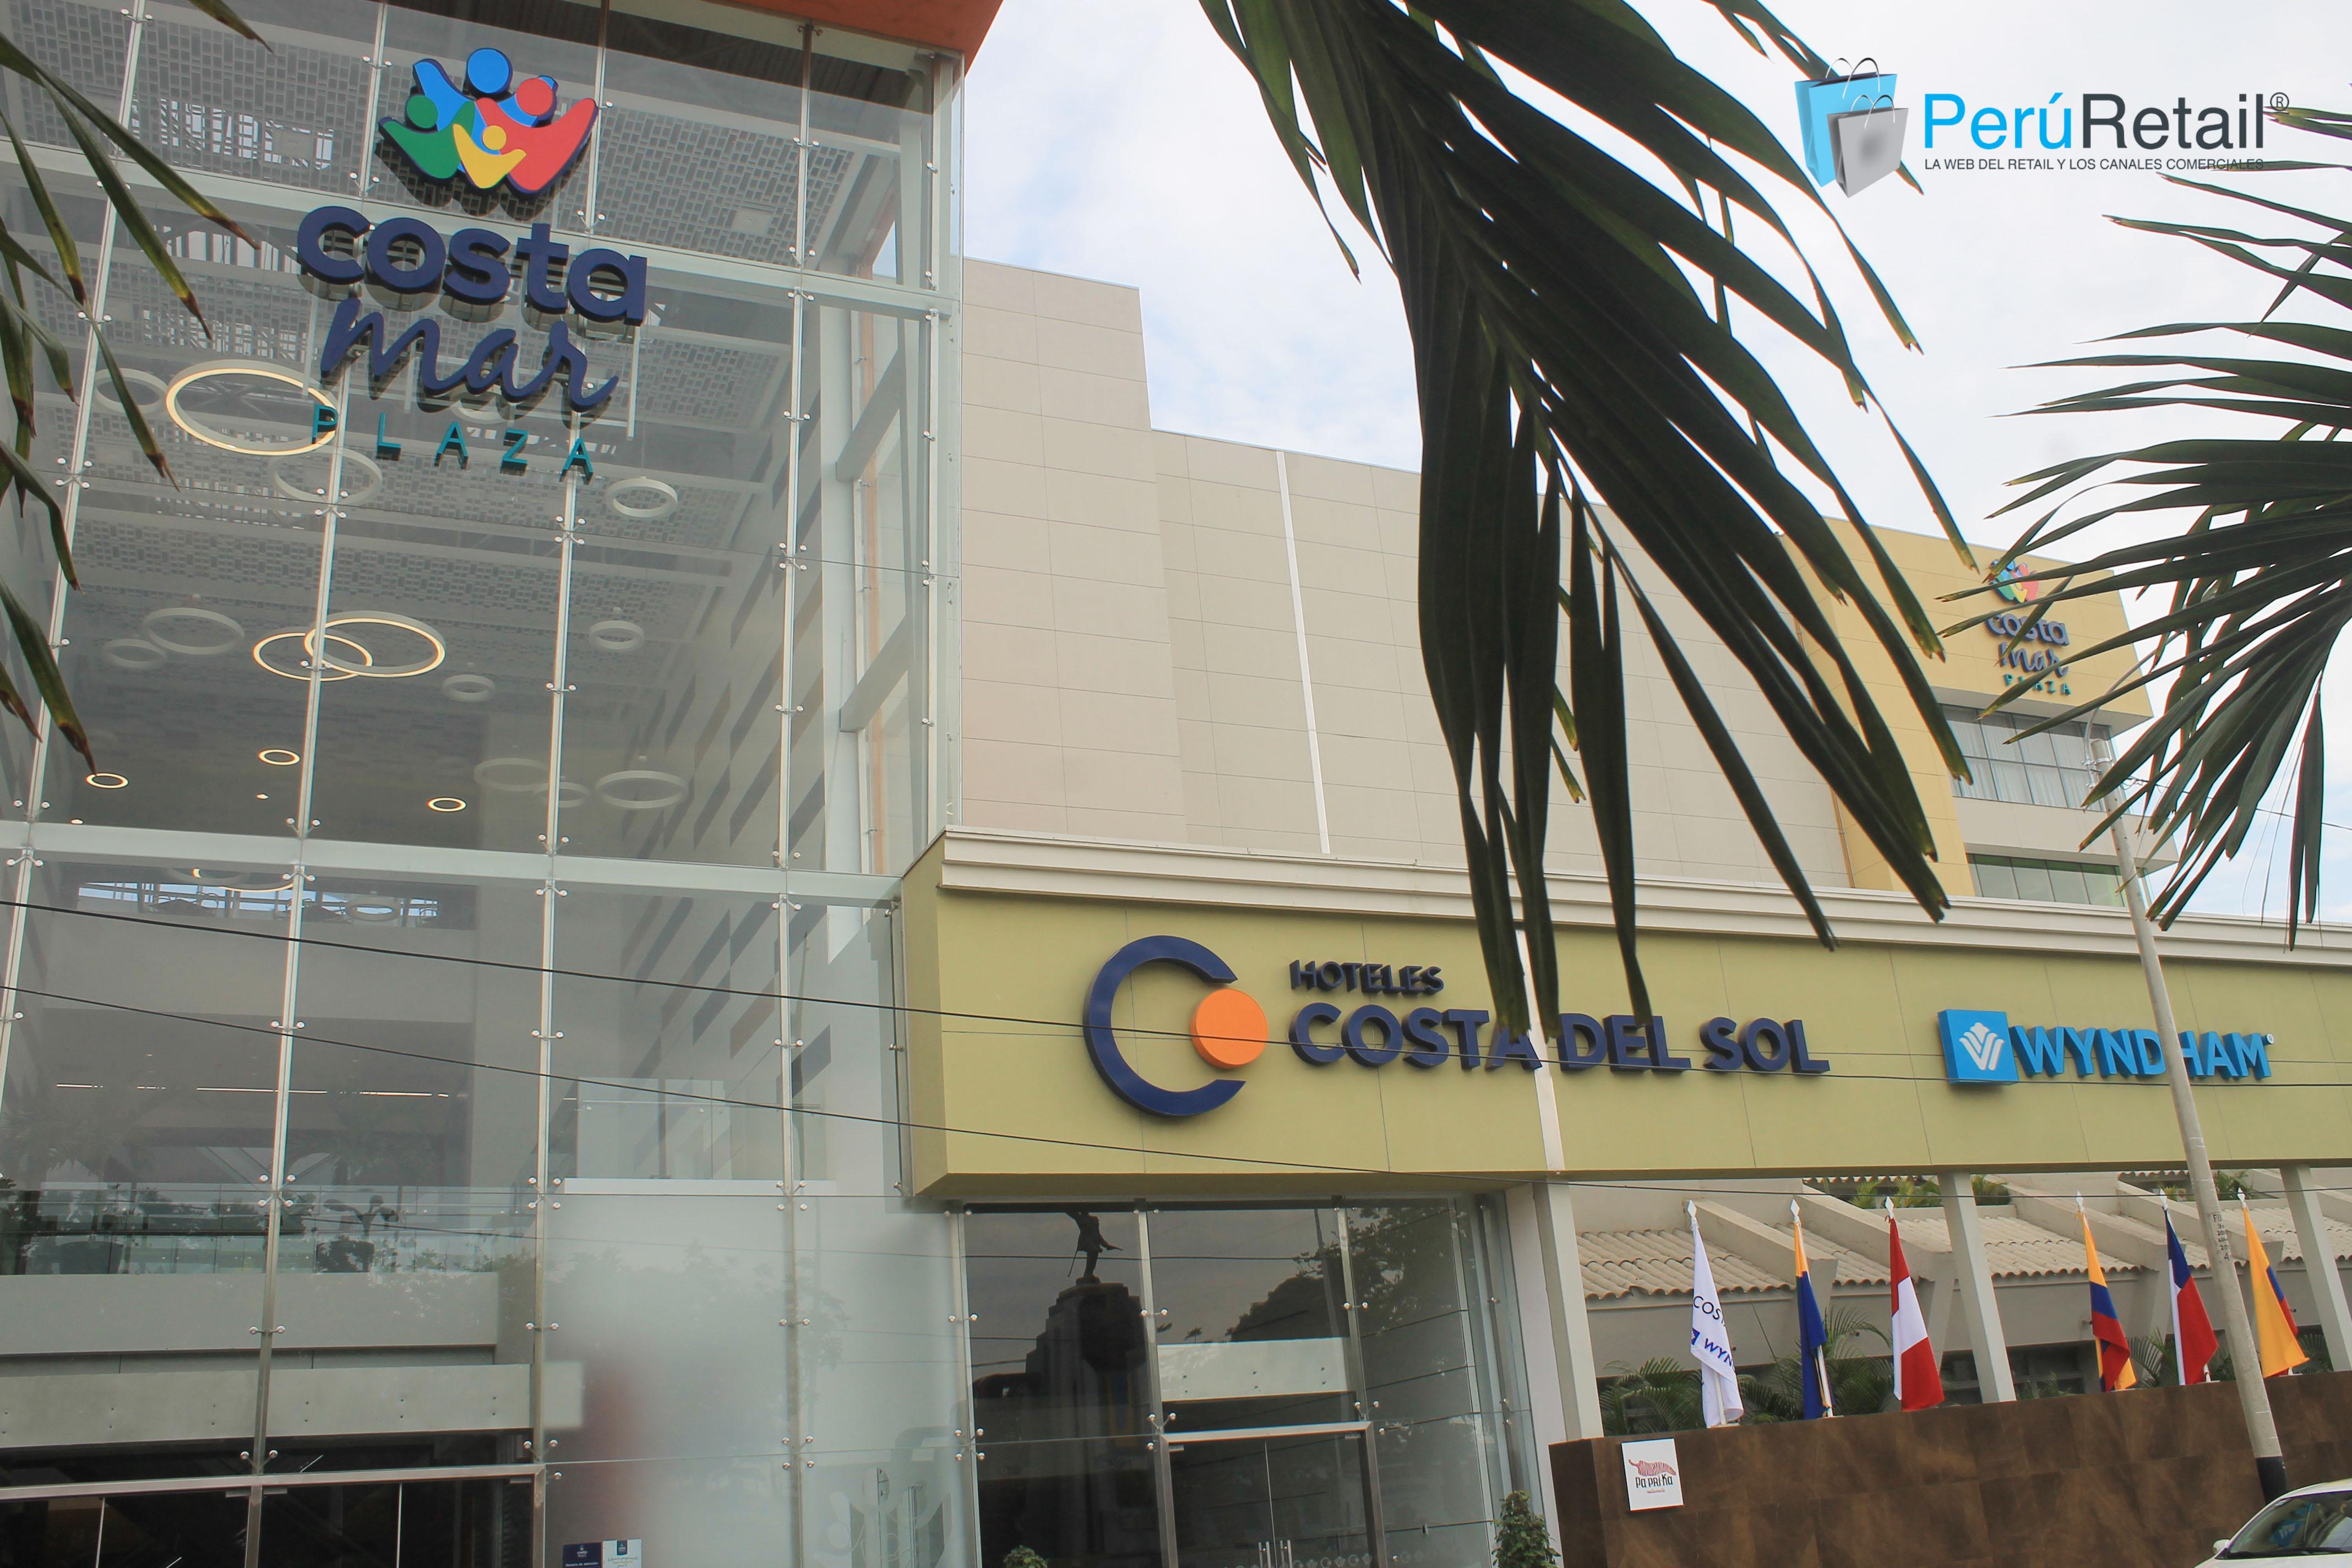 costamar2 - Costa Mar Plaza invirtió US$ 33 millones para abrir primer mall en Tumbes